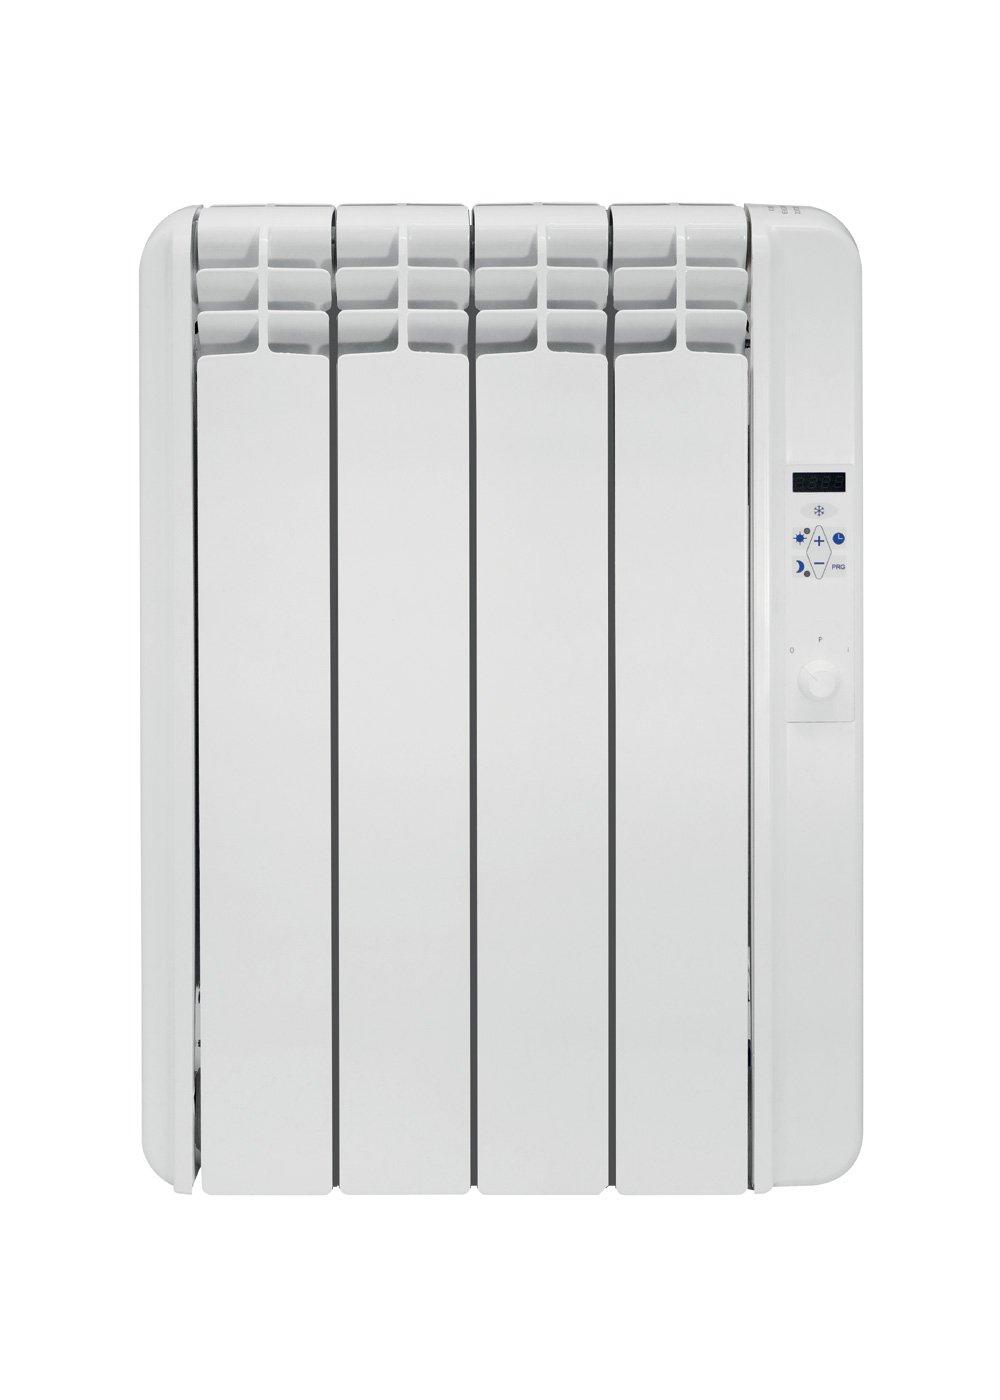 Slimline electric heaters wall mounted - Exrad Slimline E4 500 Watt Energy Efficient Electric Radiators Wall Mounted Digital Control Timer High